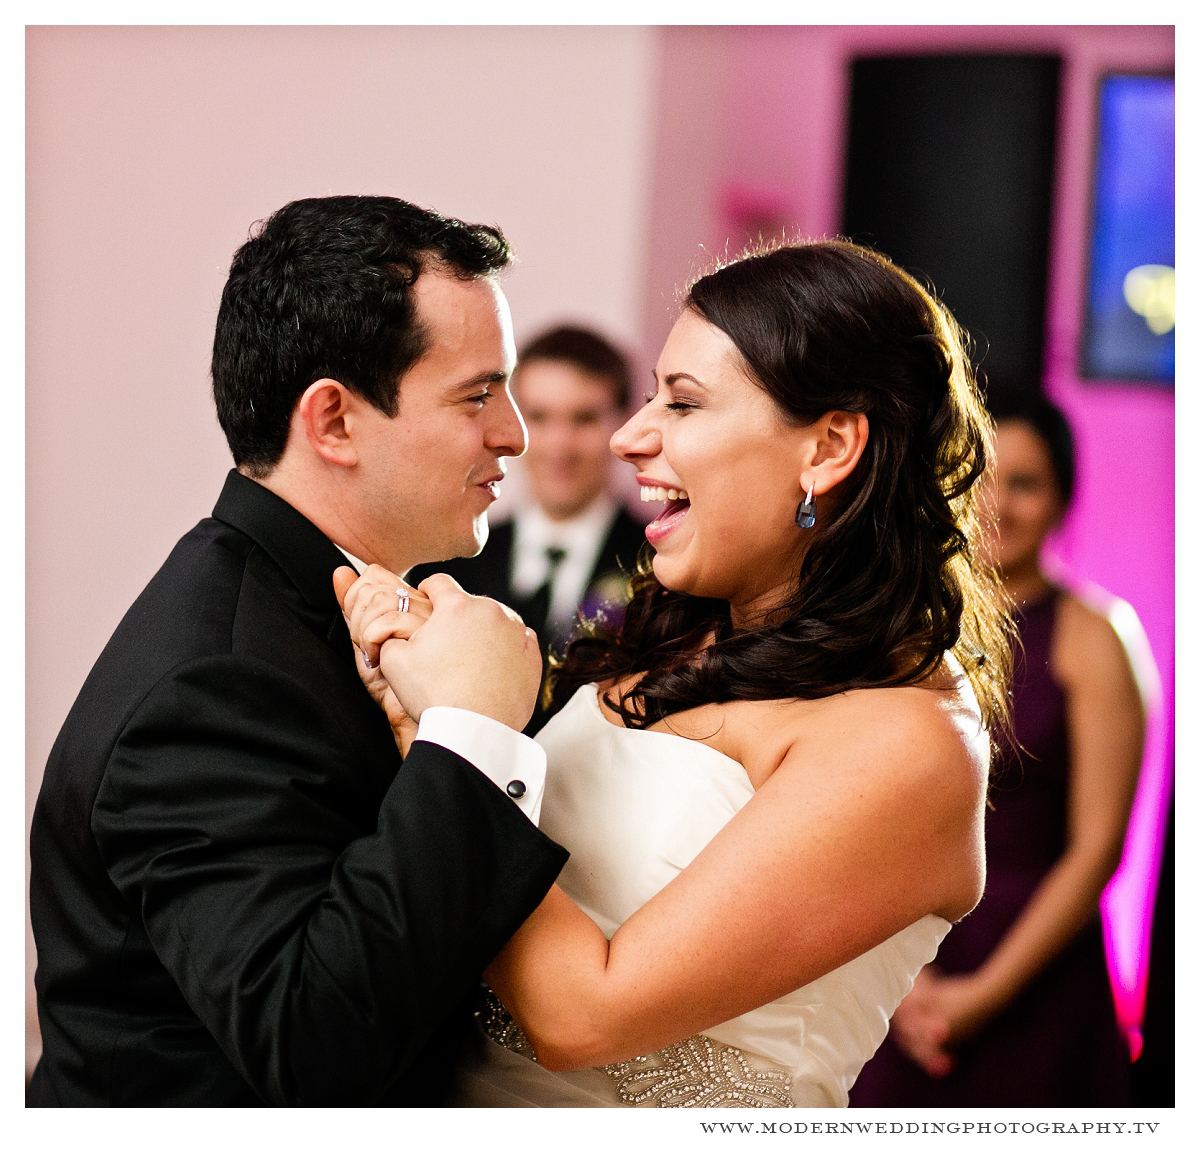 Modern Wedding Photography 0710 .jpg